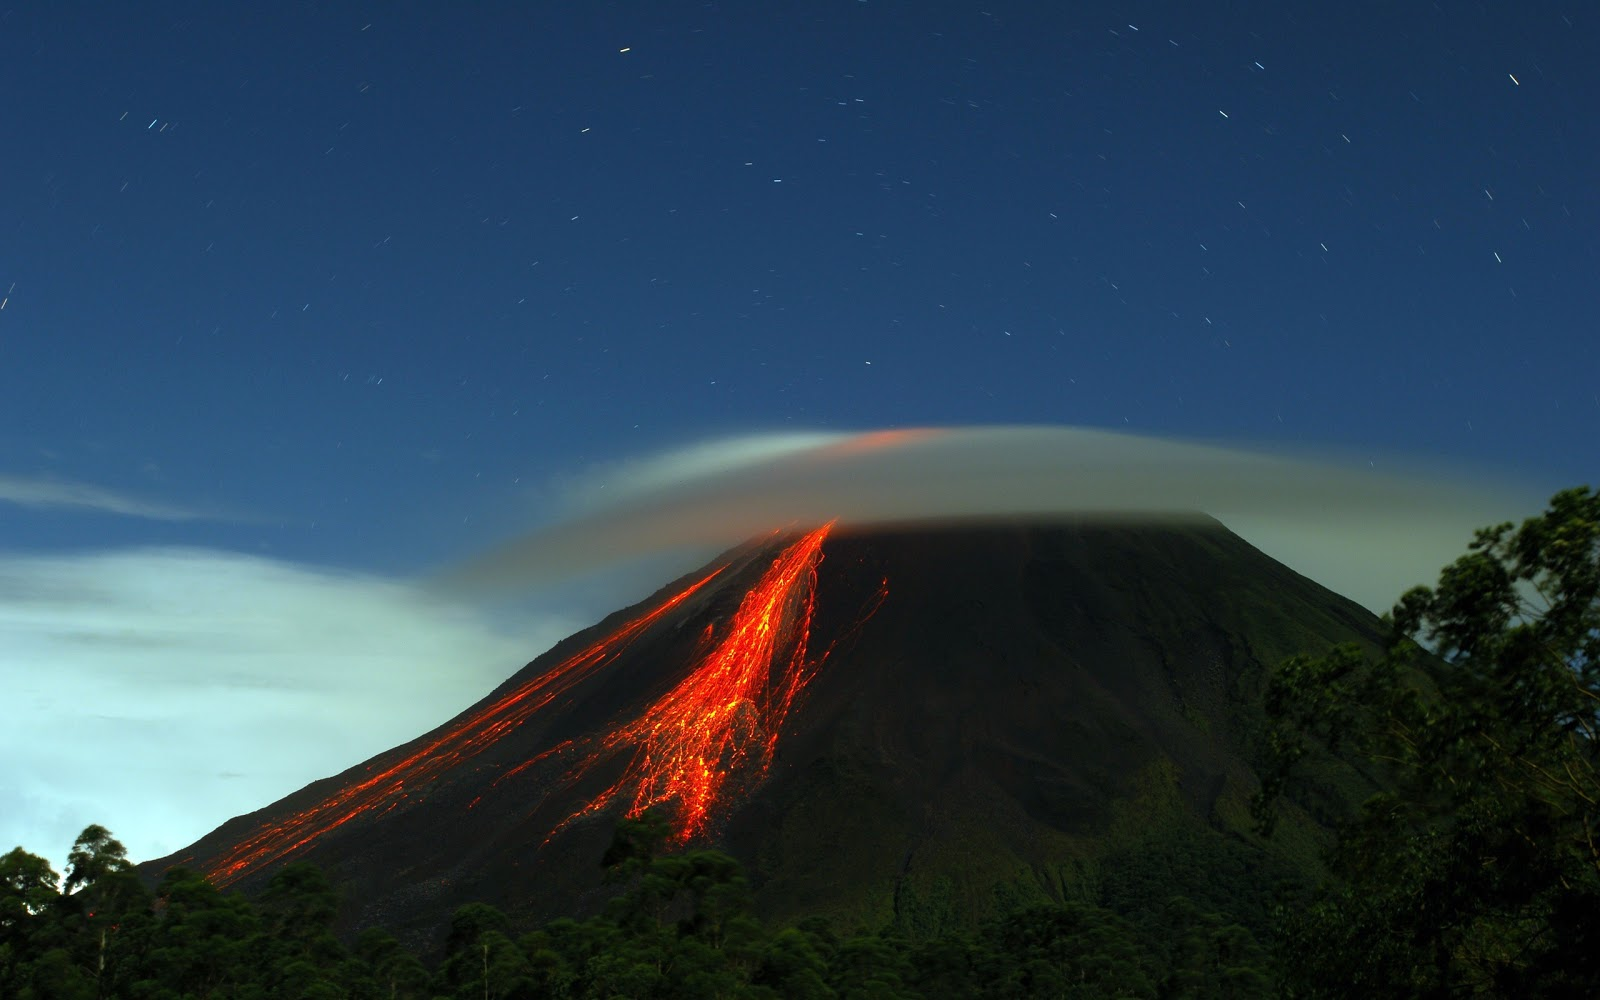 insert lamp Anal lava